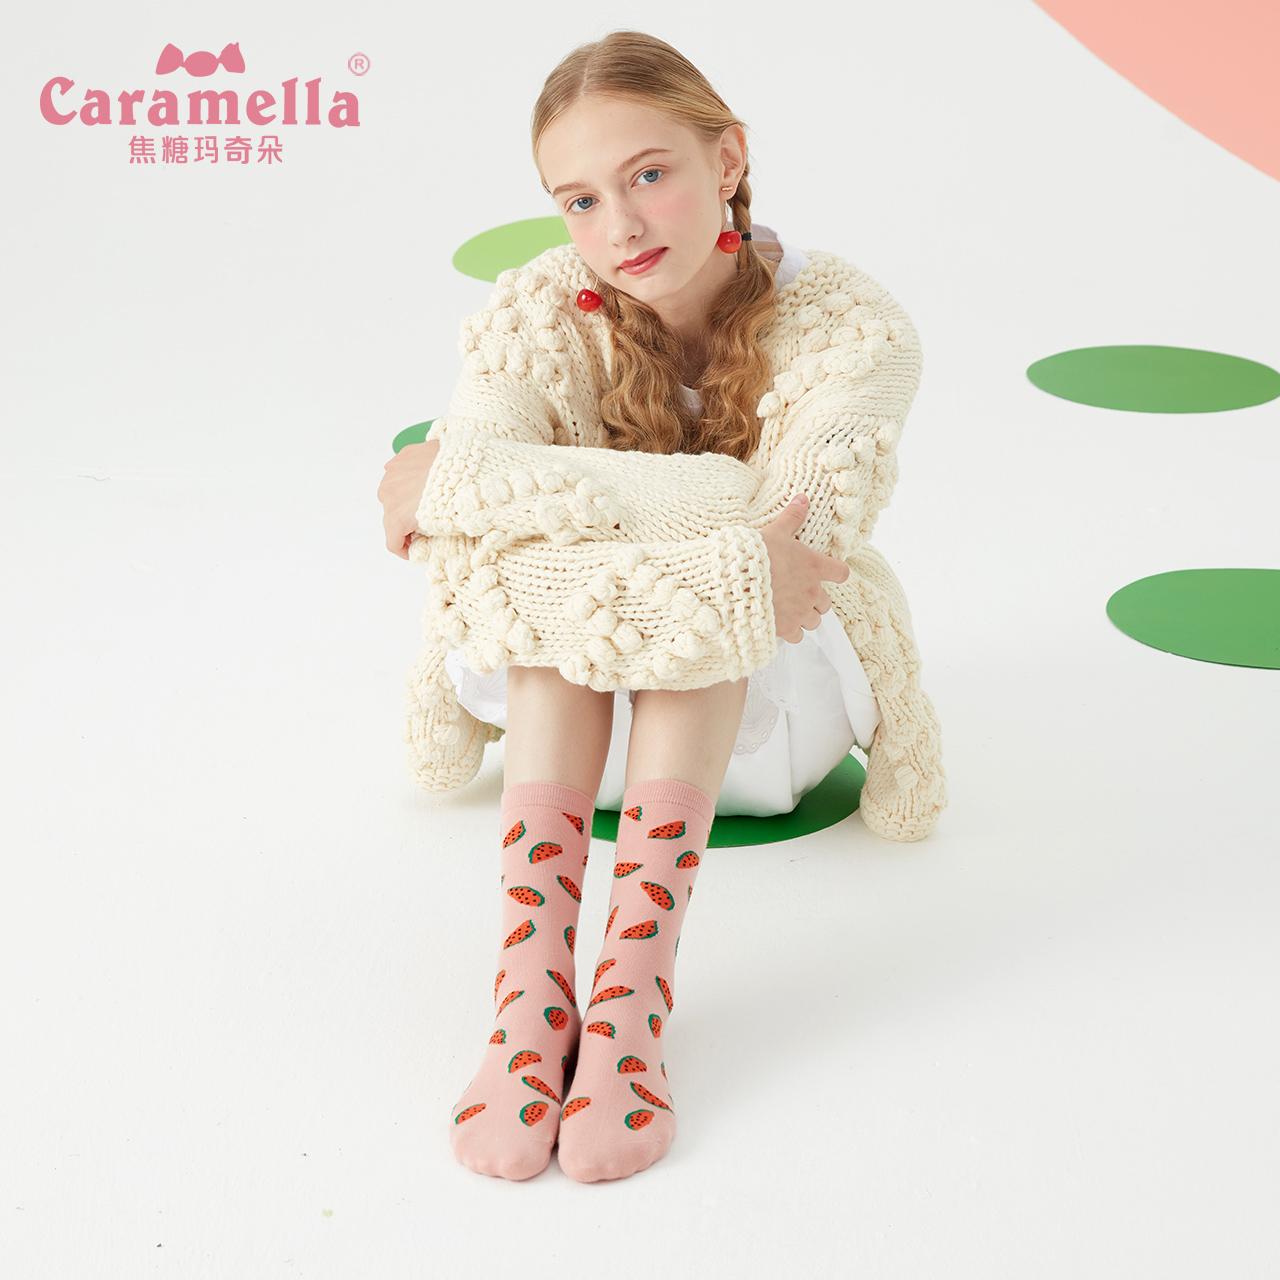 caramella袜子女士中筒袜长袜街头ins潮秋冬季棉袜水果韩版ulzza